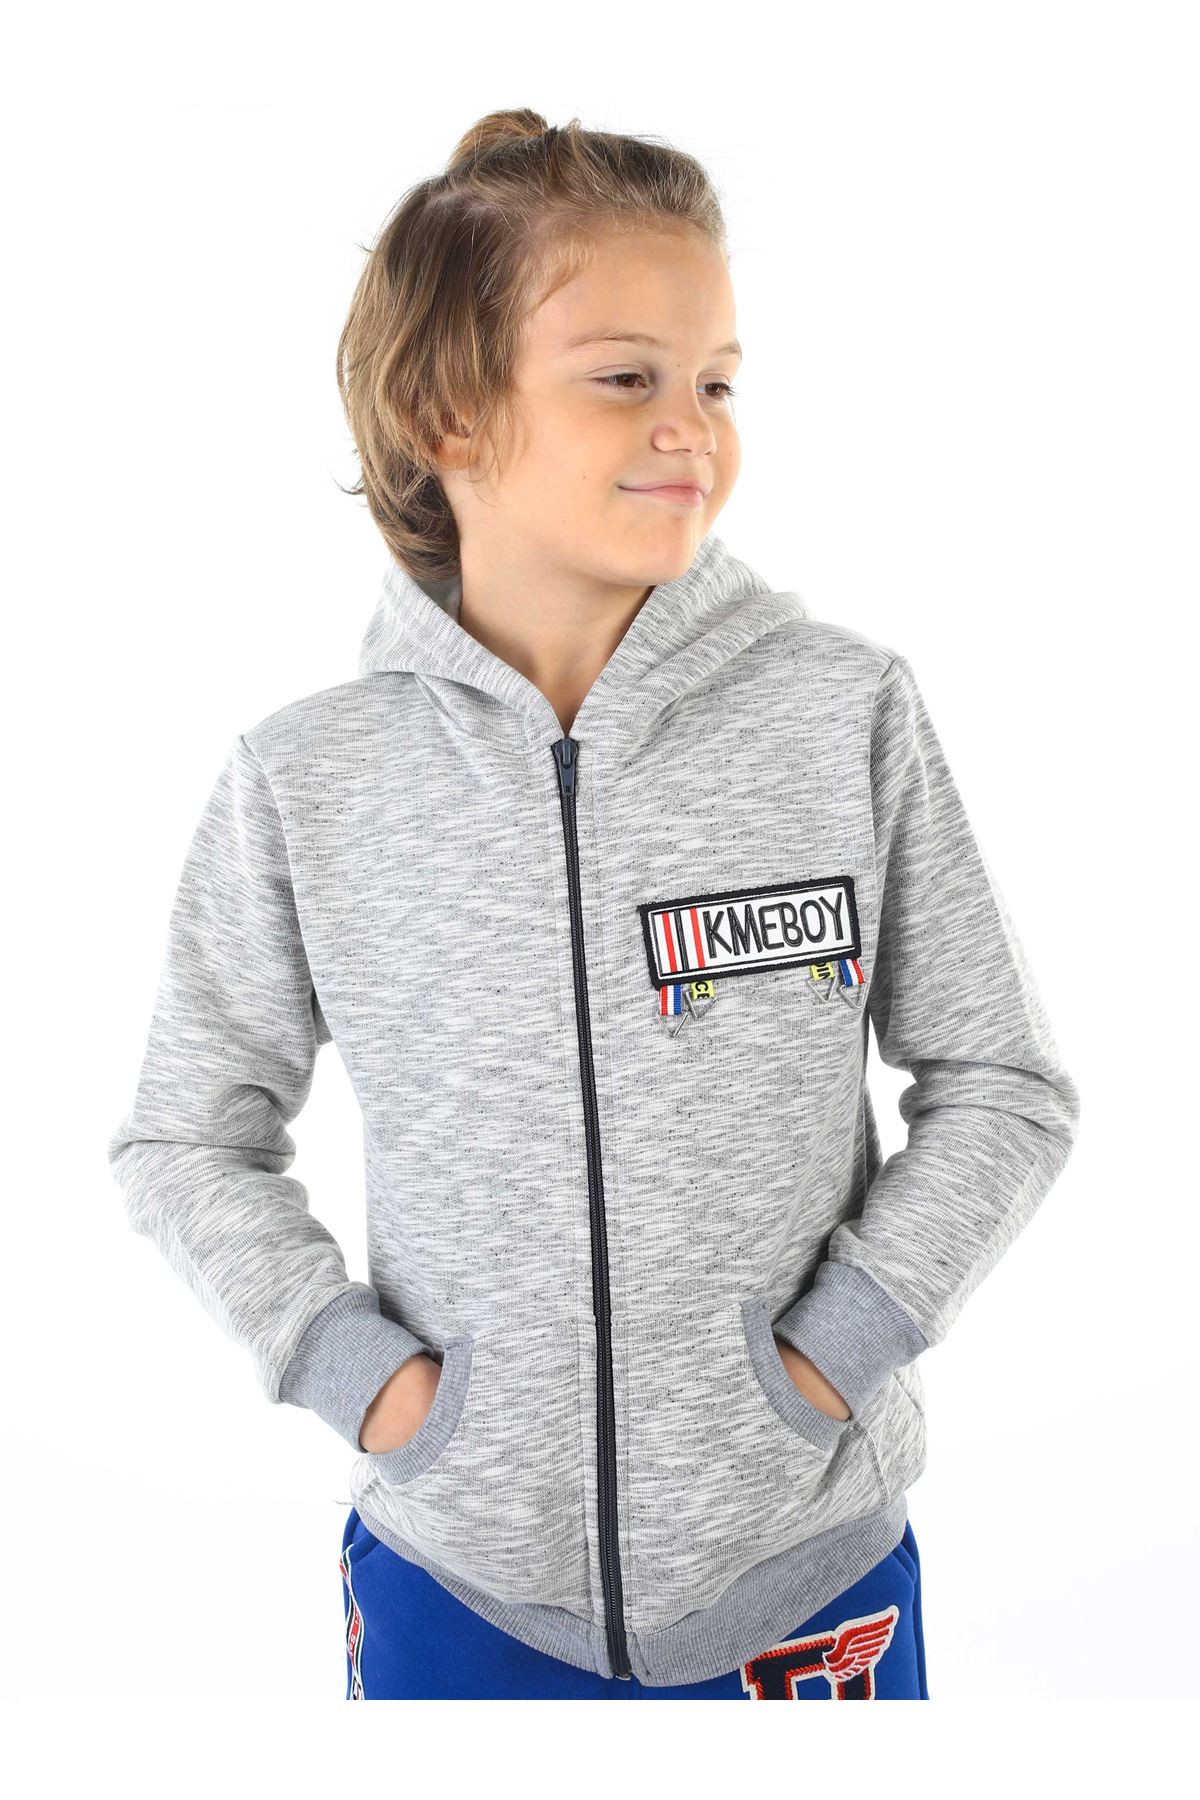 Gray Winter Male Child Jacket